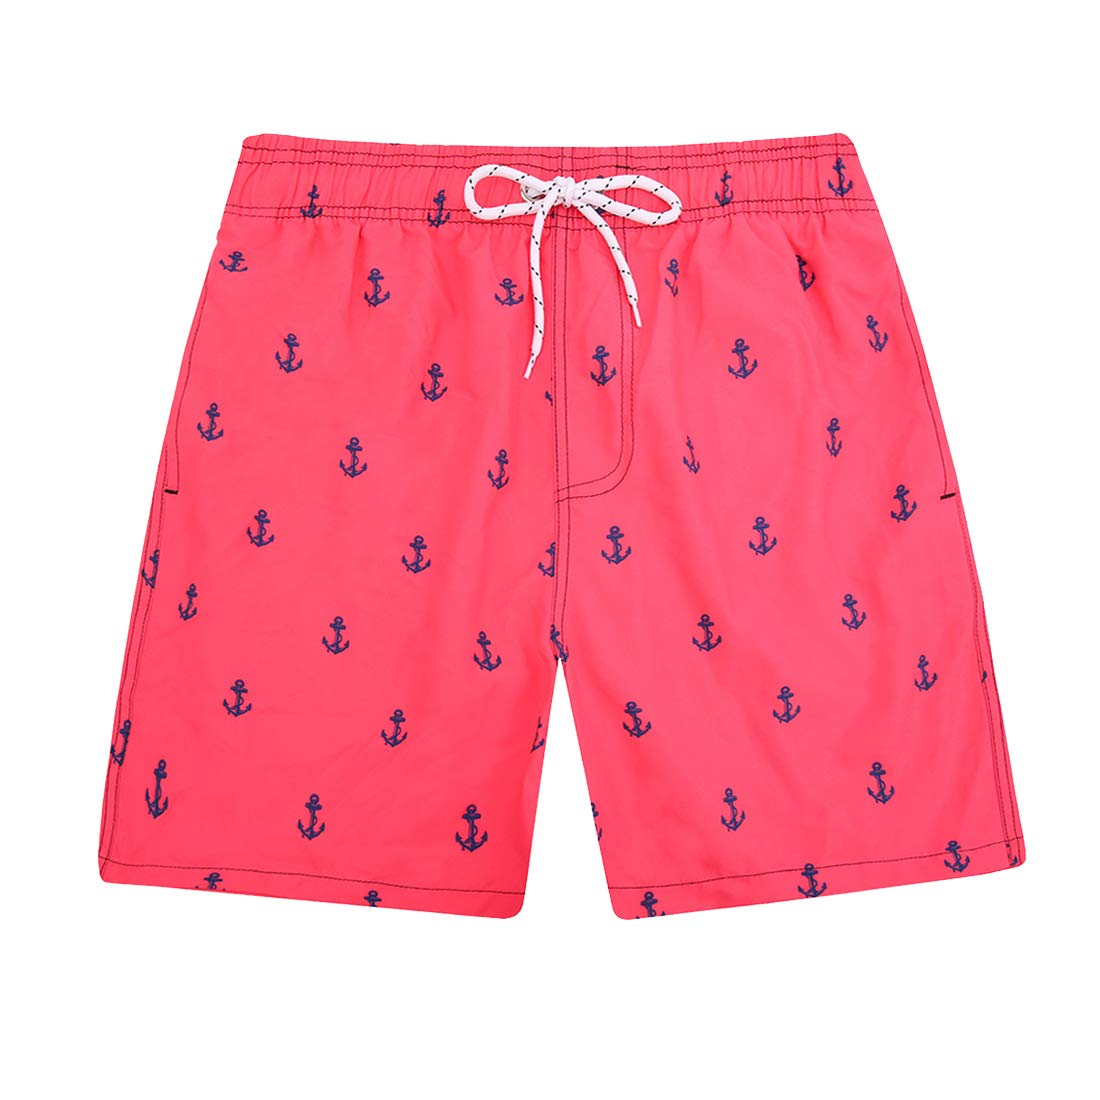 UNICOMIDEA Boys Beach Shorts Quick Dry Beach Swim Trunks Kids Swimsuit Beach Shorts with Mesh Lining for 5-14 Years